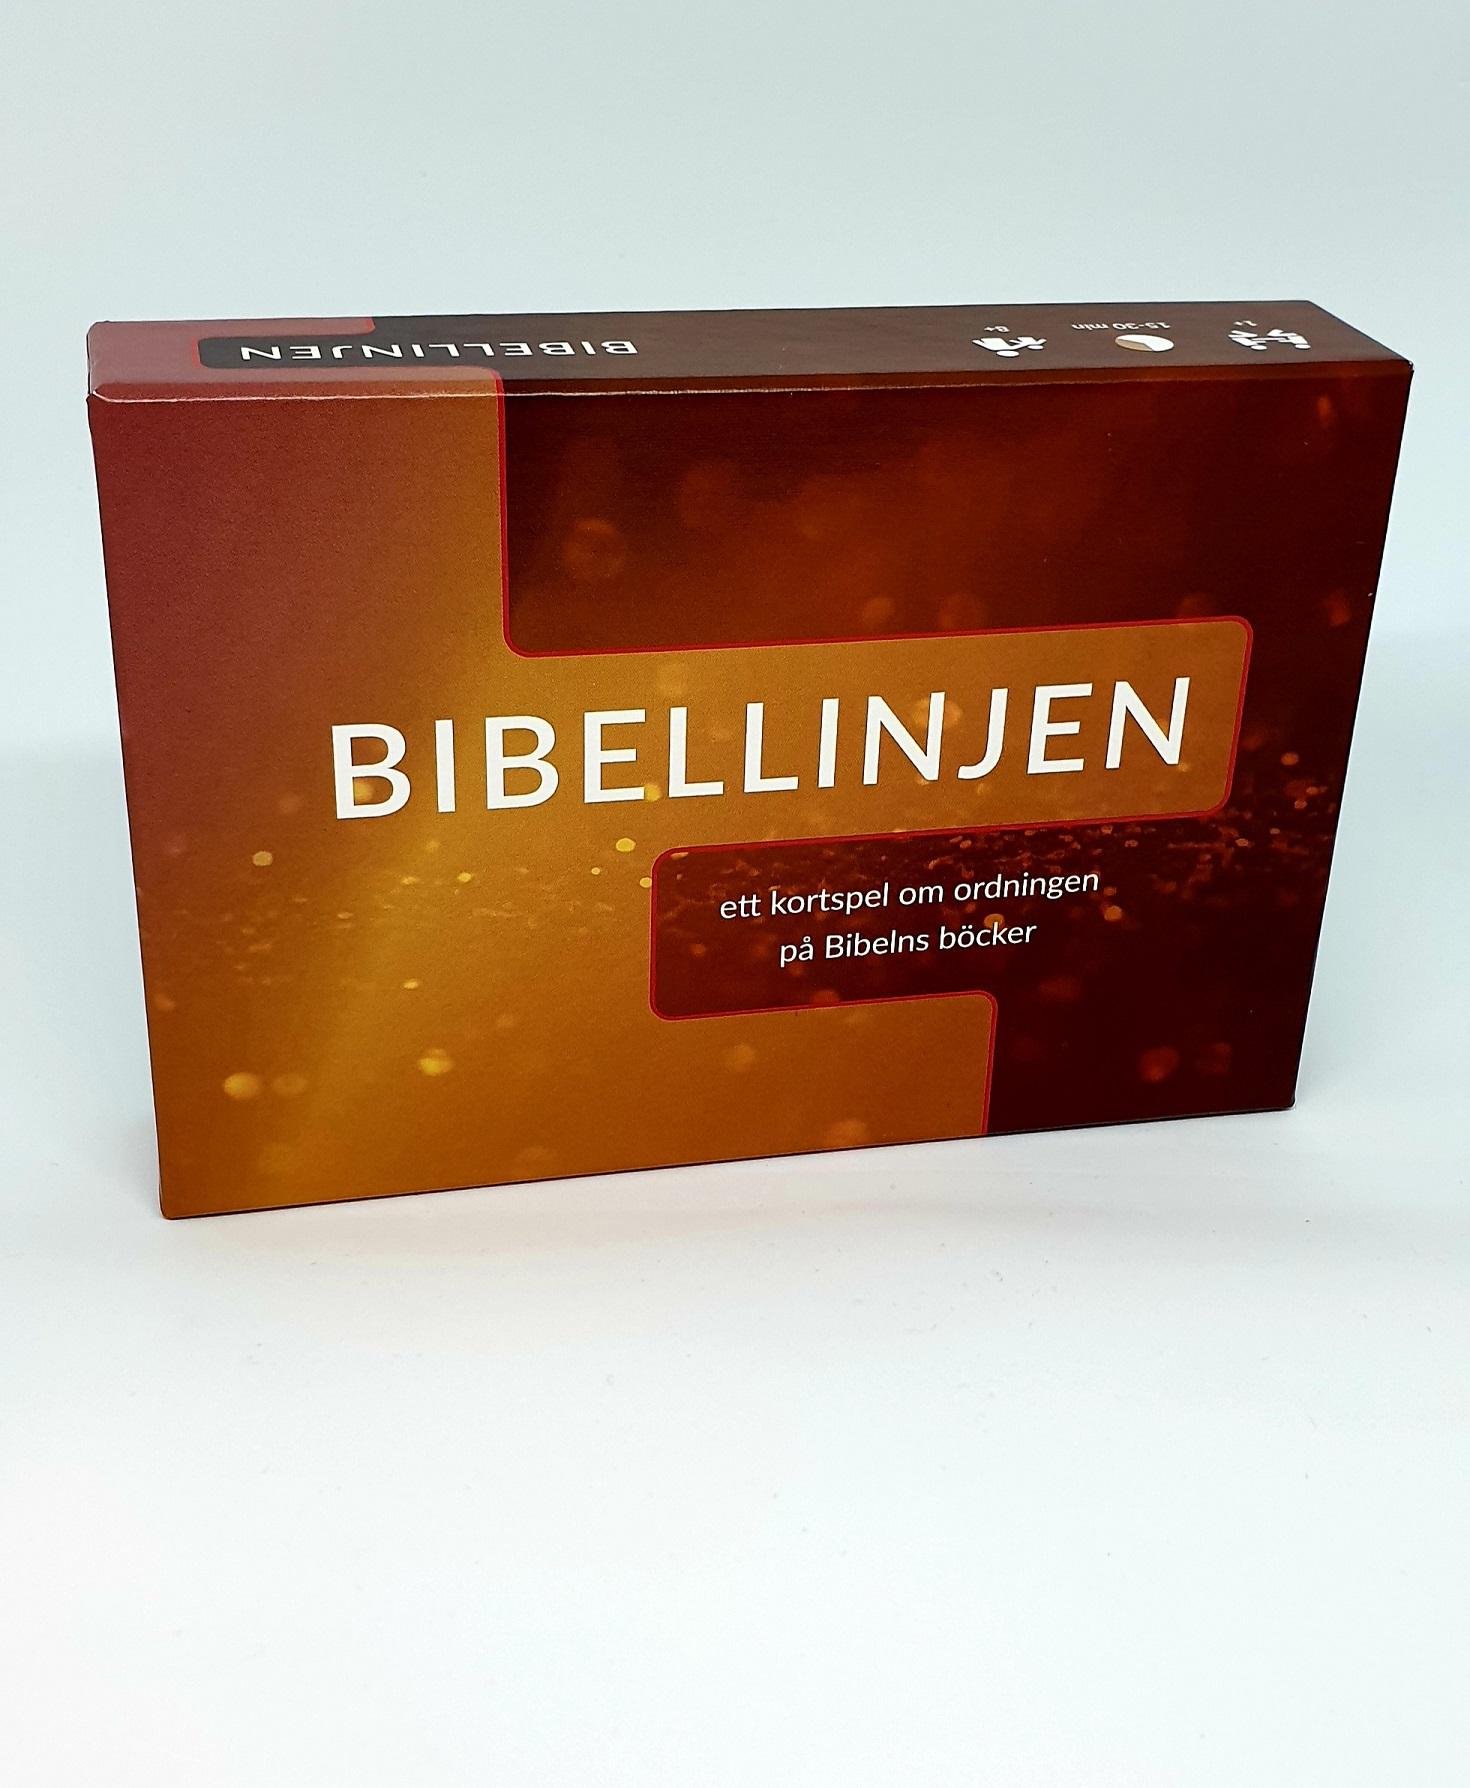 Bibellinjen artikelnummer 2575 via bibelbutiken.se kortspel